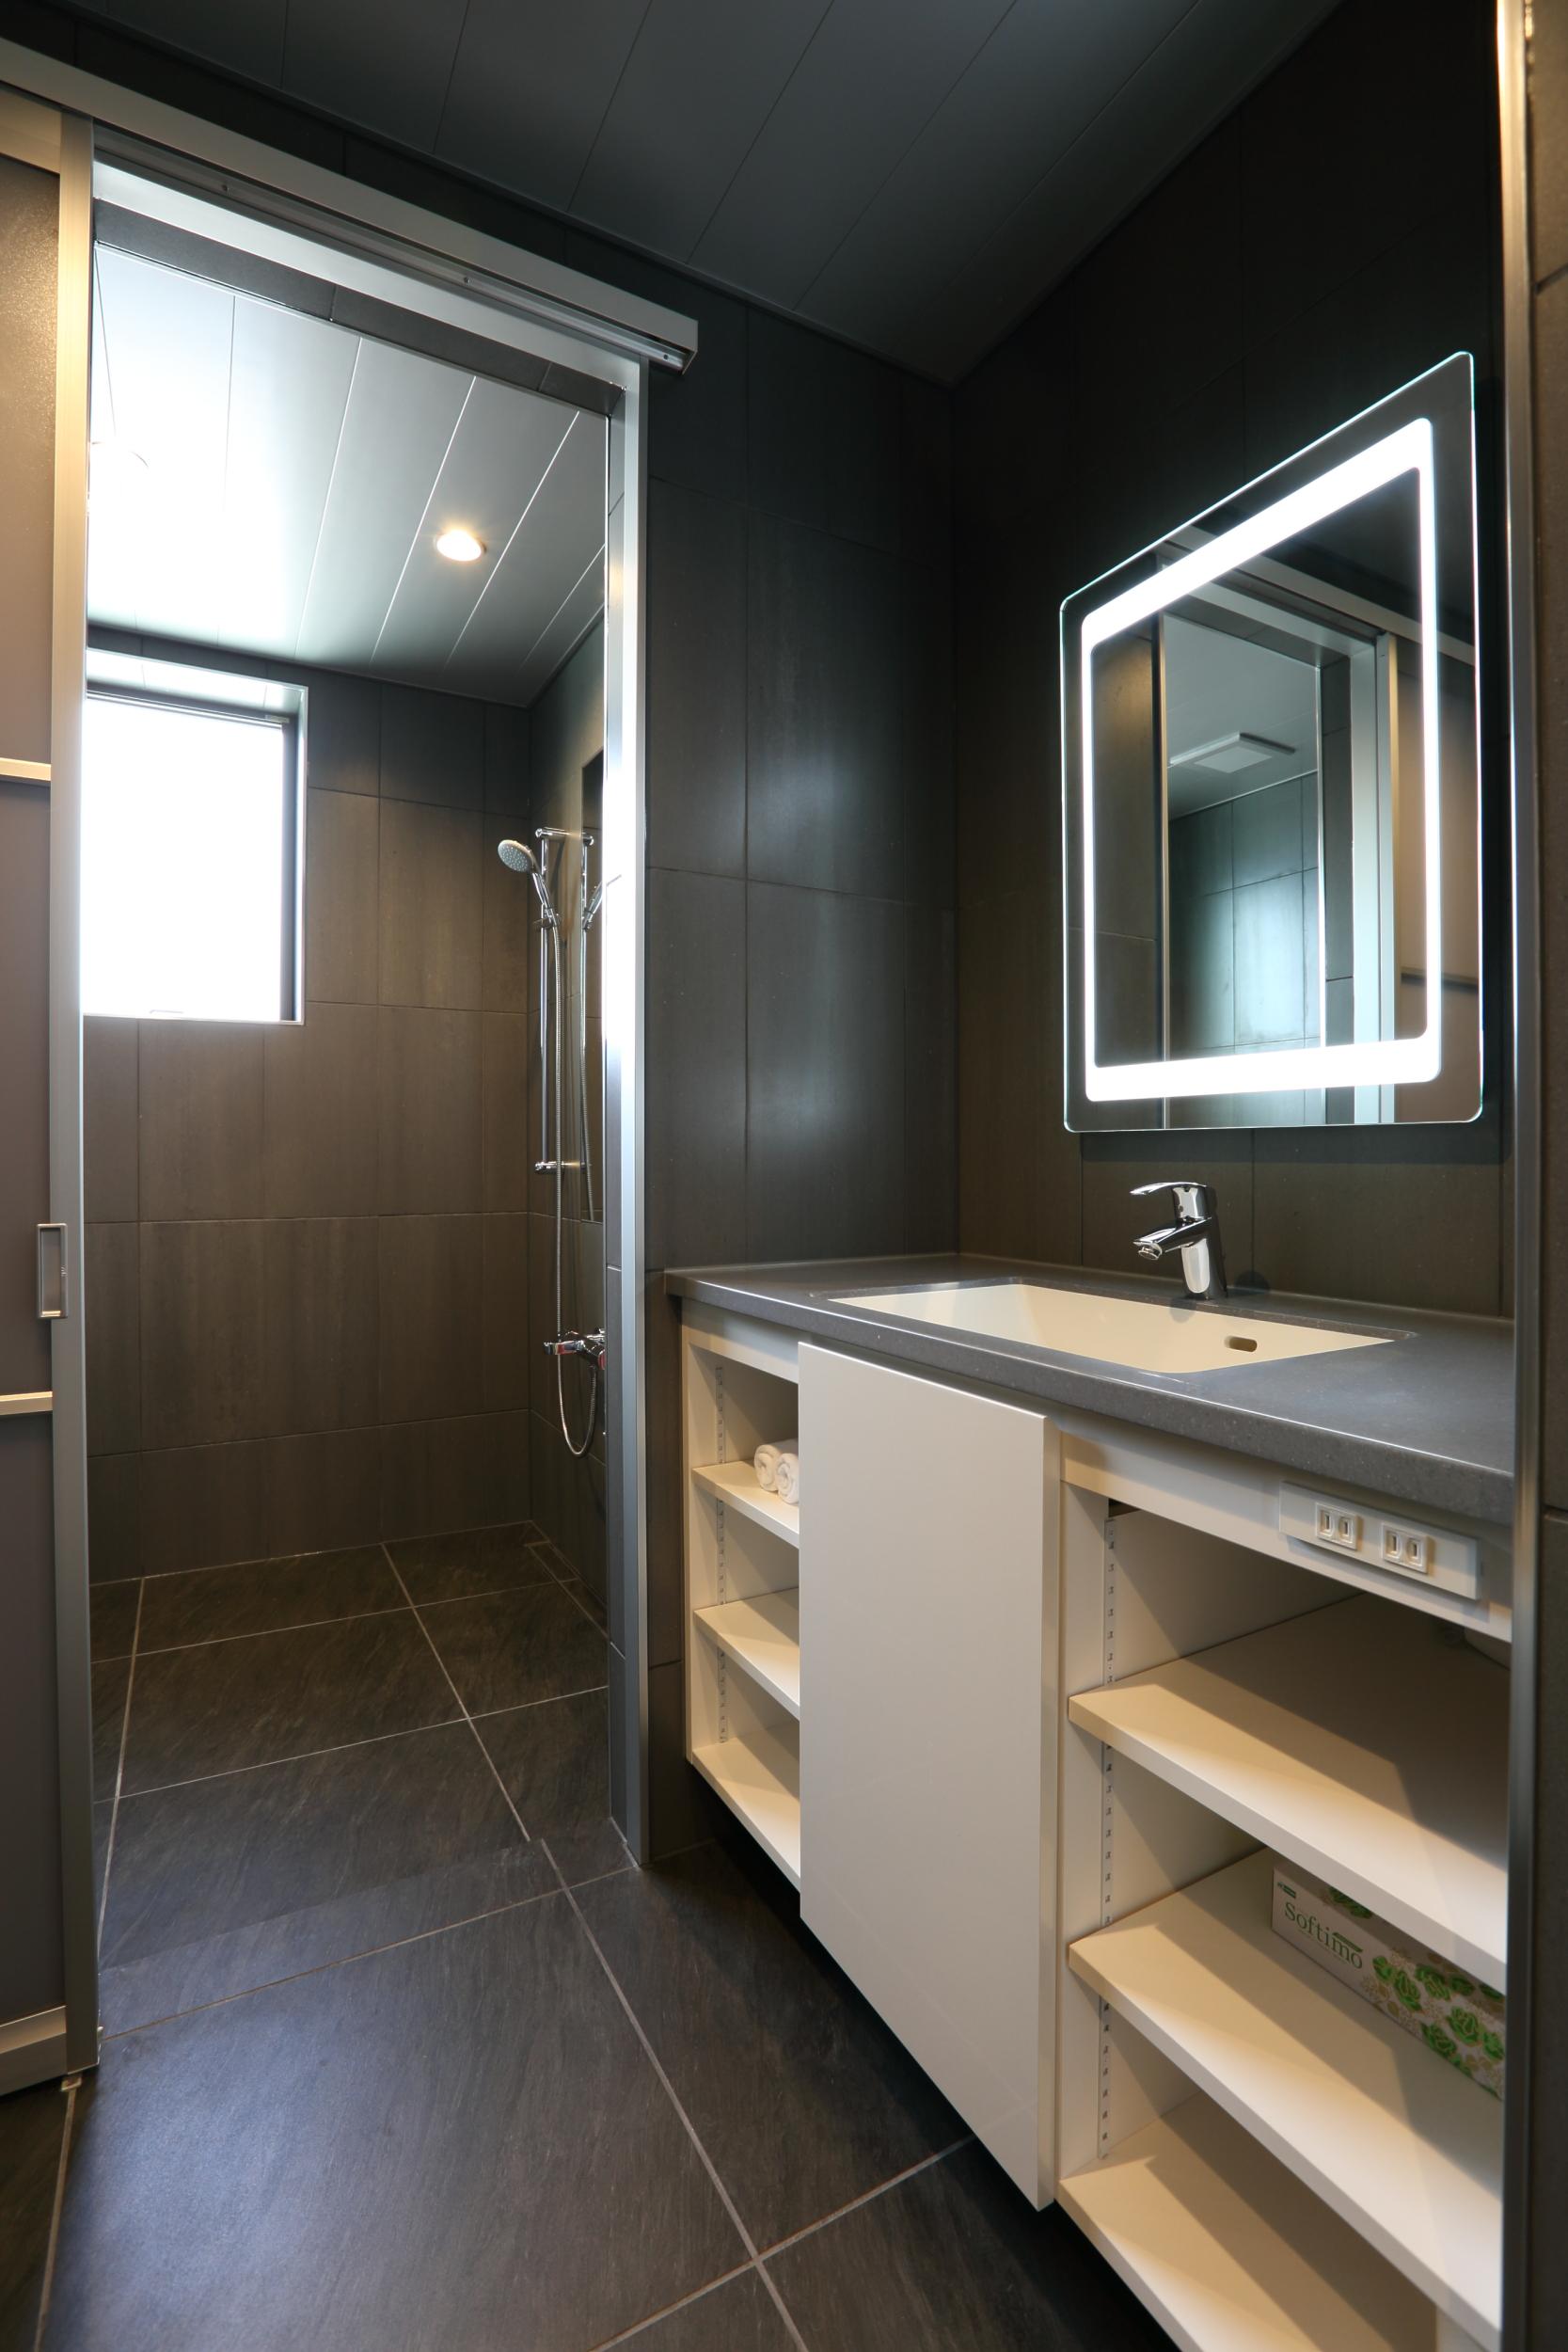 bluebird apartments bathroom.jpg